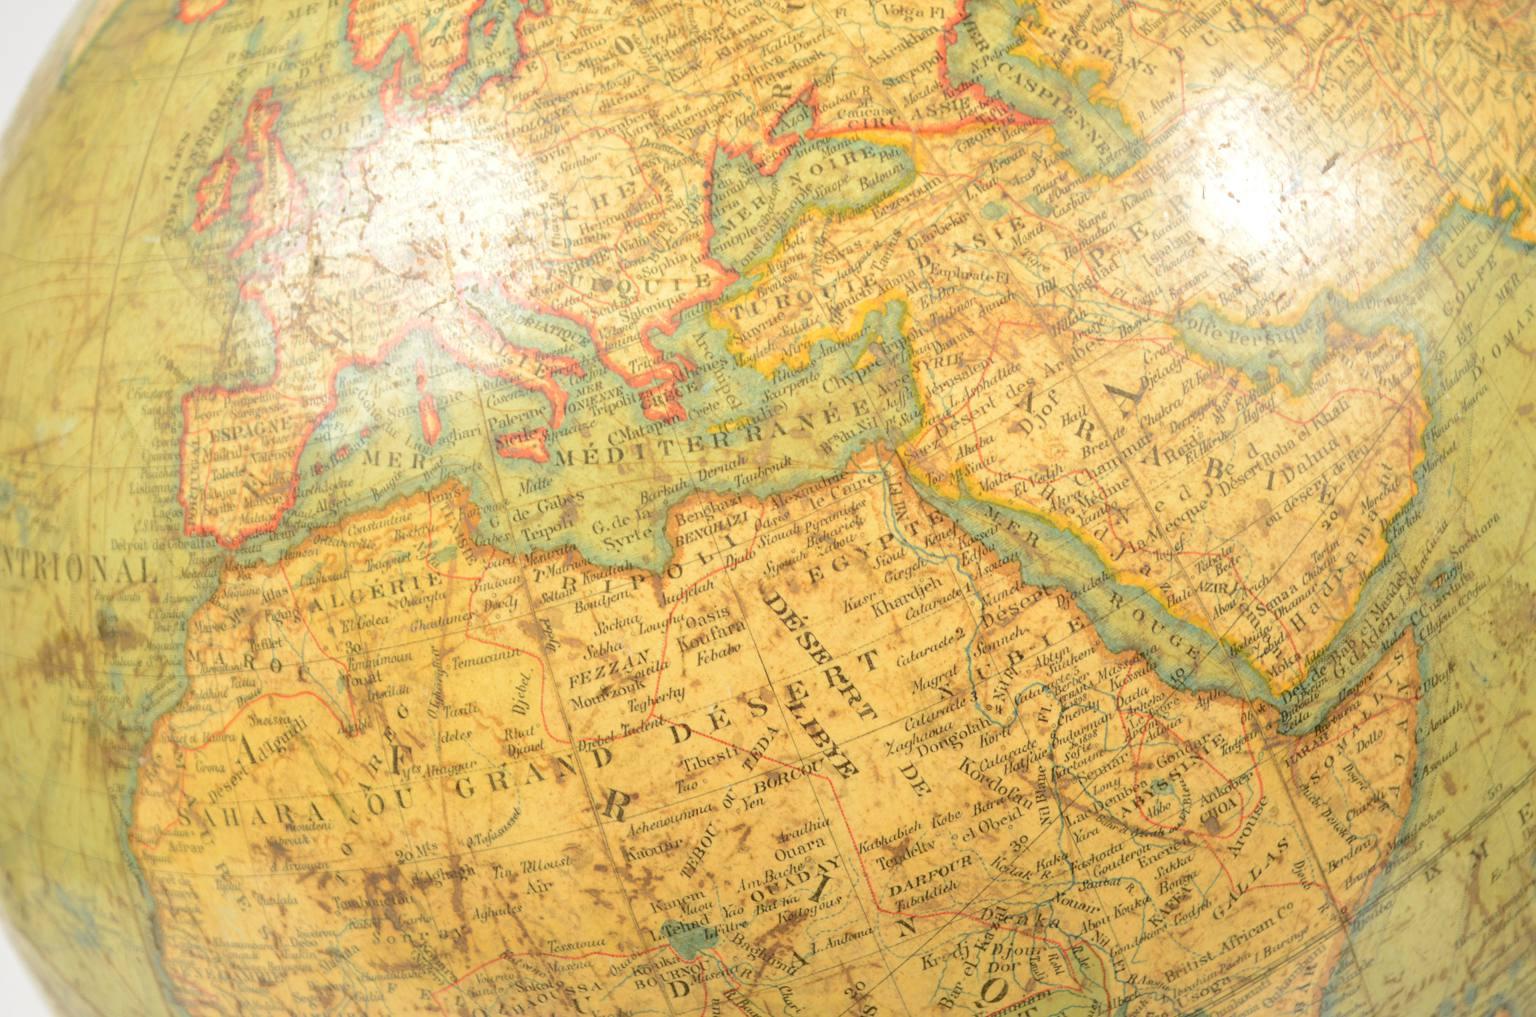 Globi-mappamondi antichi/4137A-Globo Lebegue